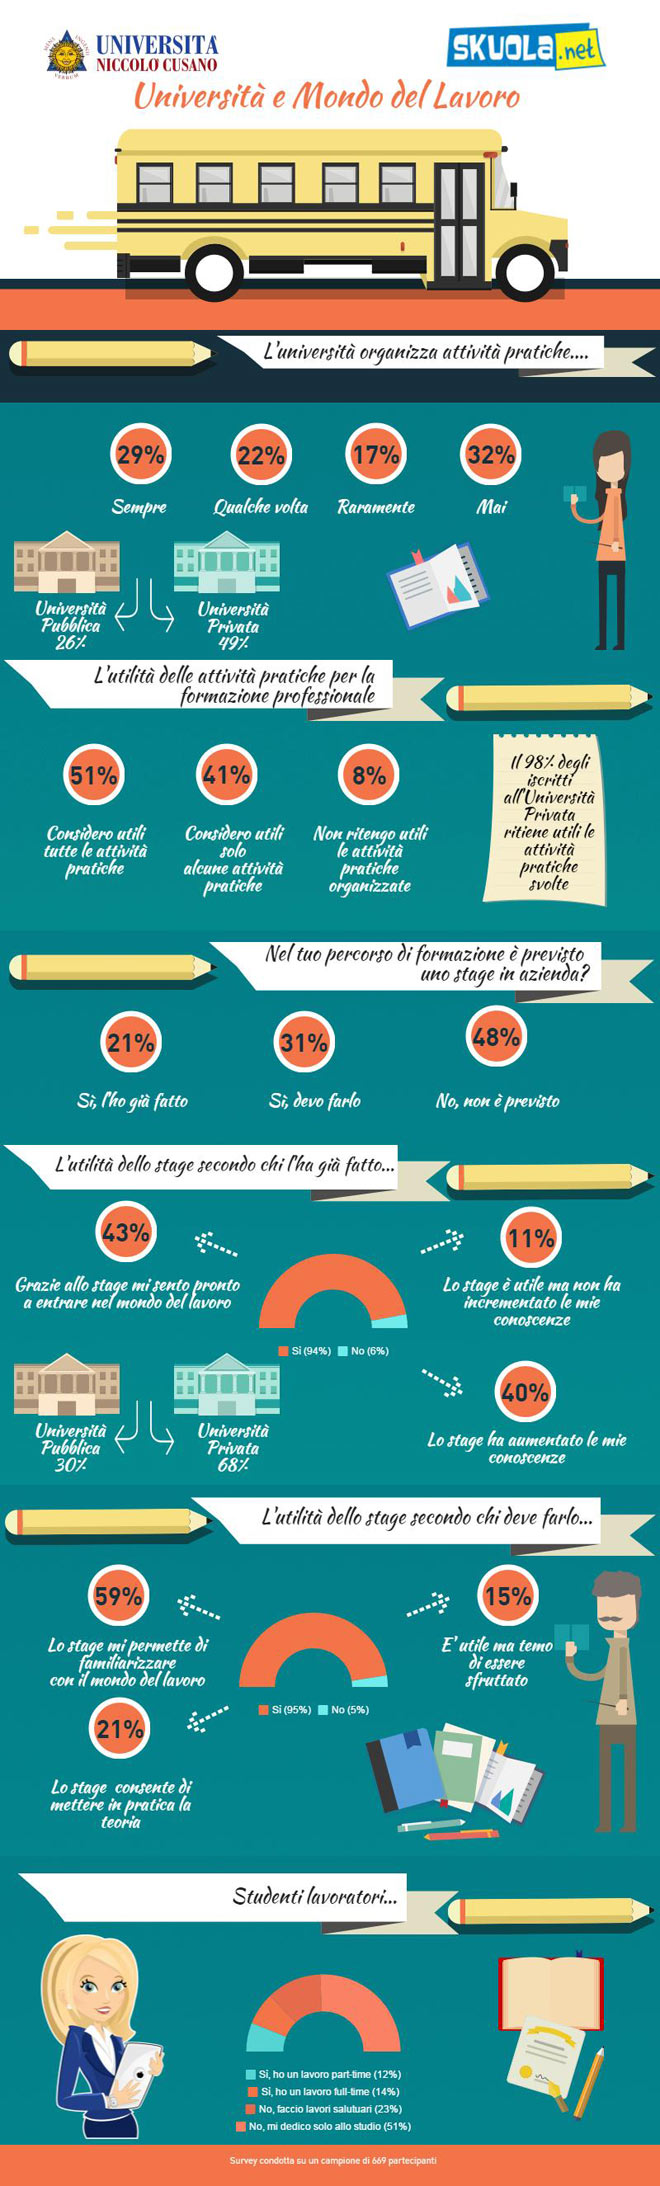 Infografica Skuola.net Unicusano